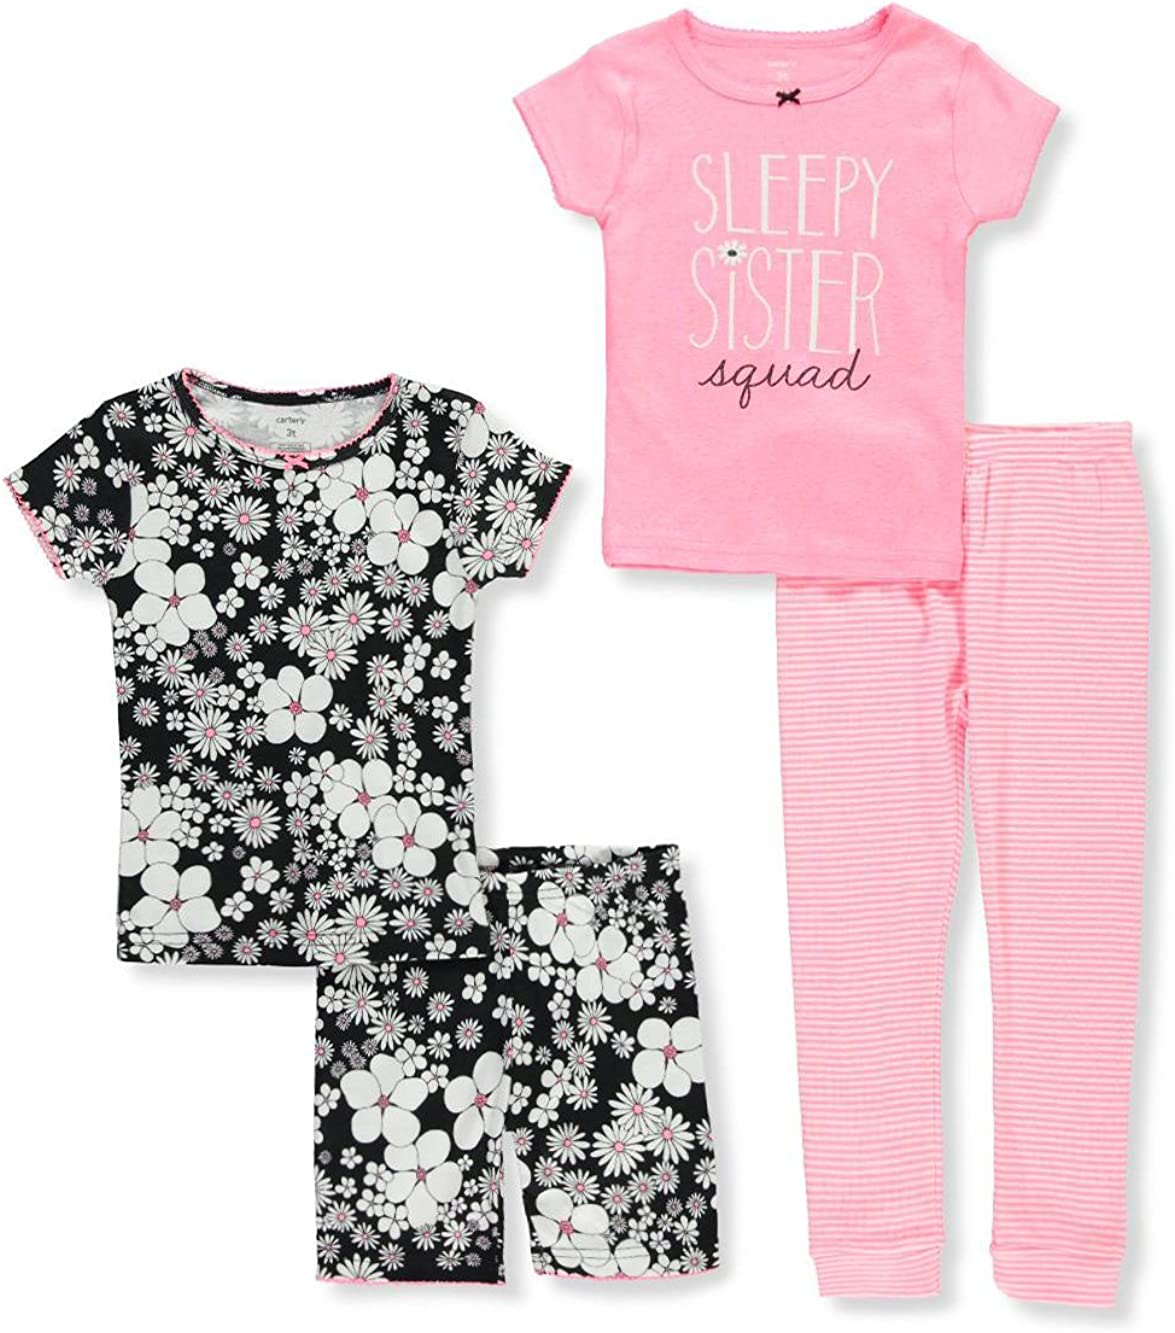 Carters Girls 6M-12 4 Piece Sleepy Sister Squad Floral Pajama Set 2T